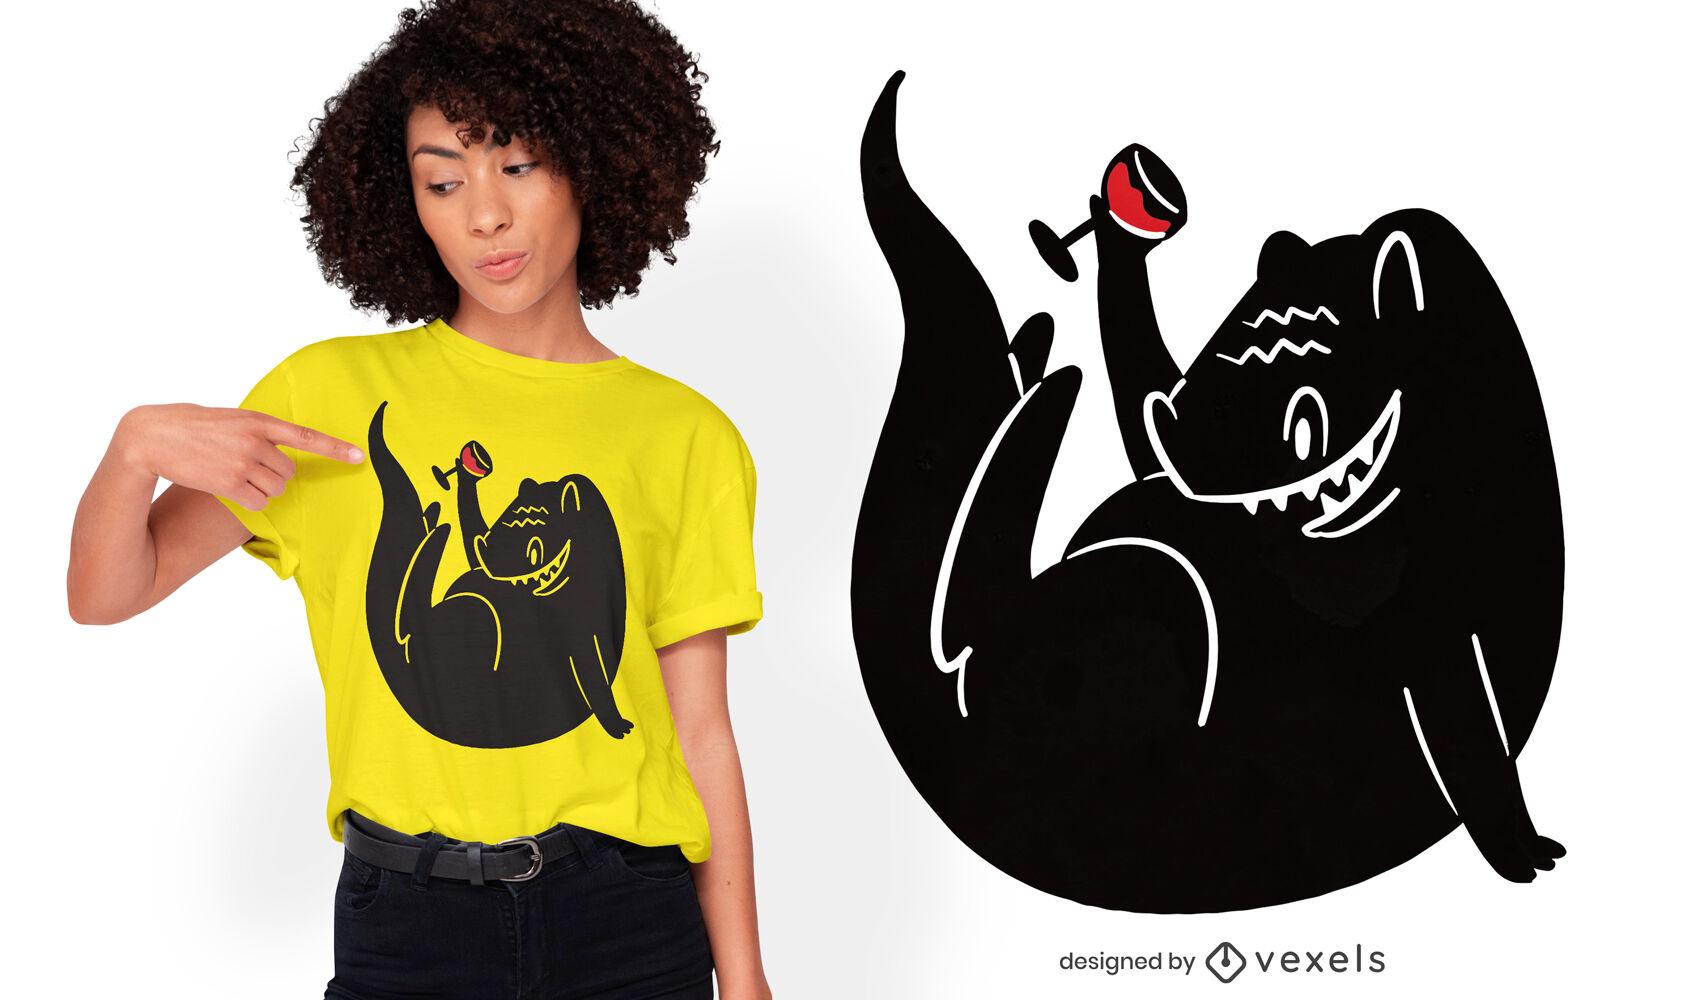 Dinosaur drinking wine t-shirt design